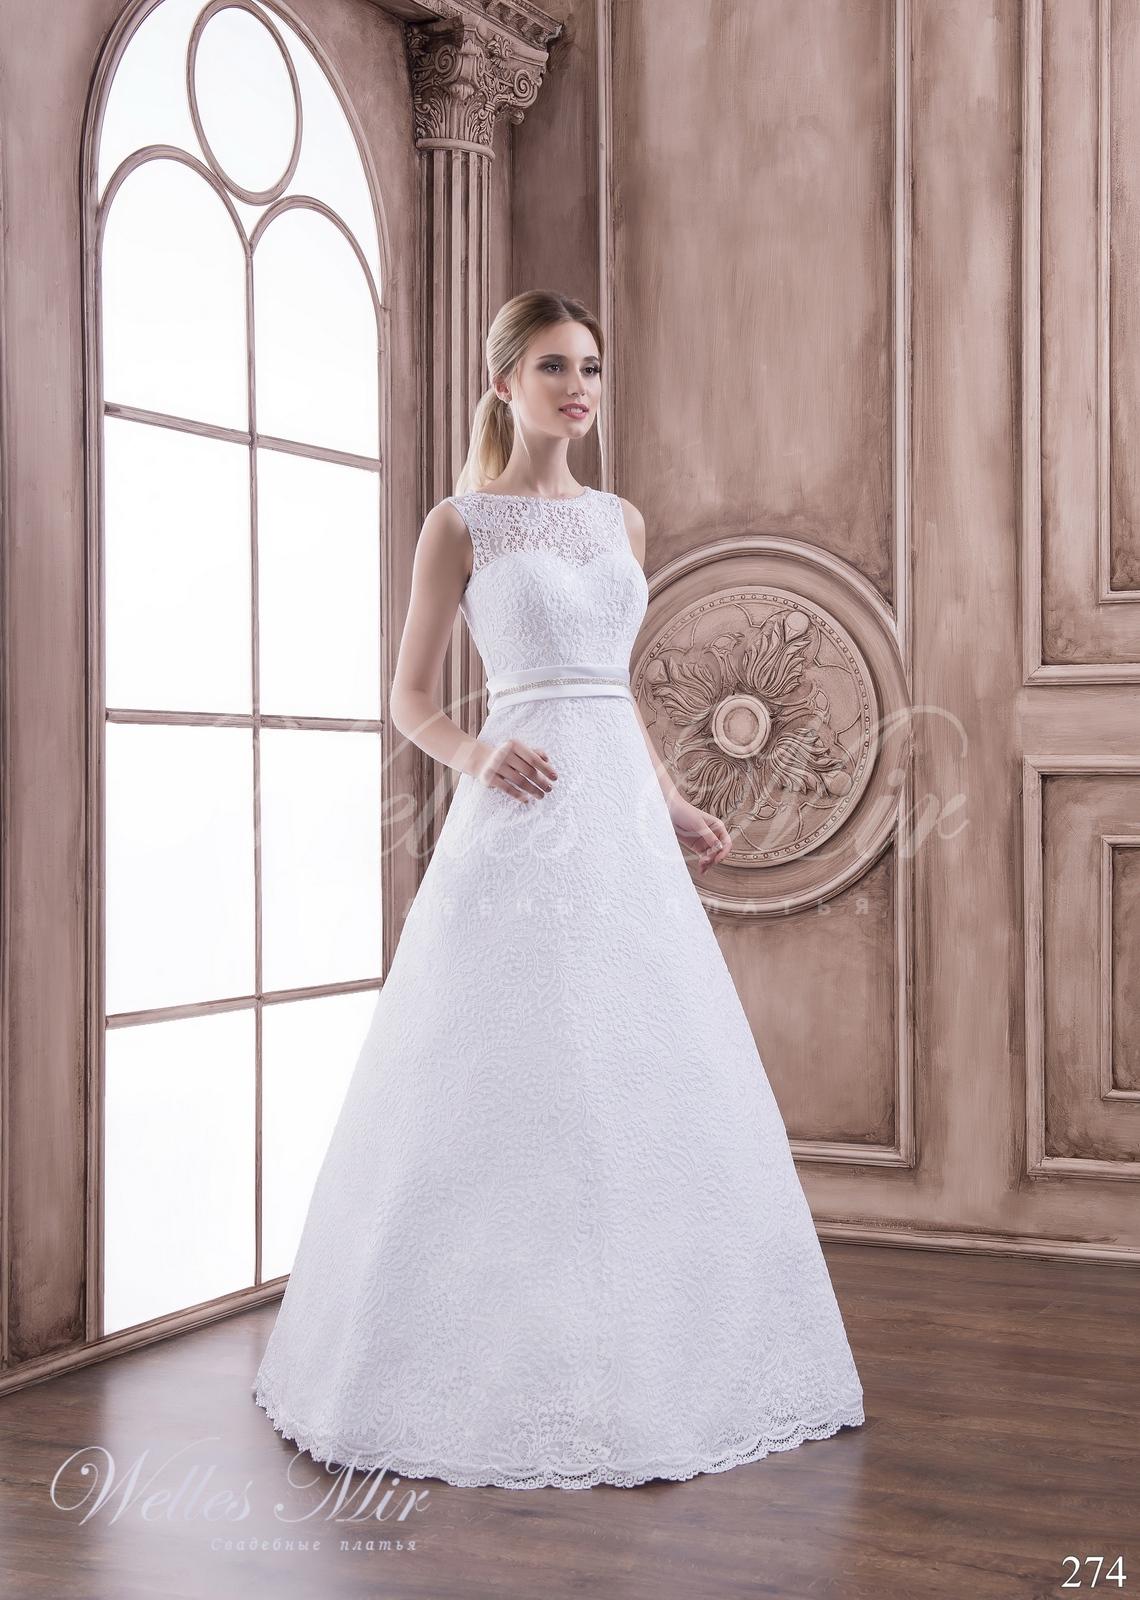 Свадебные платья Tenderness - 274